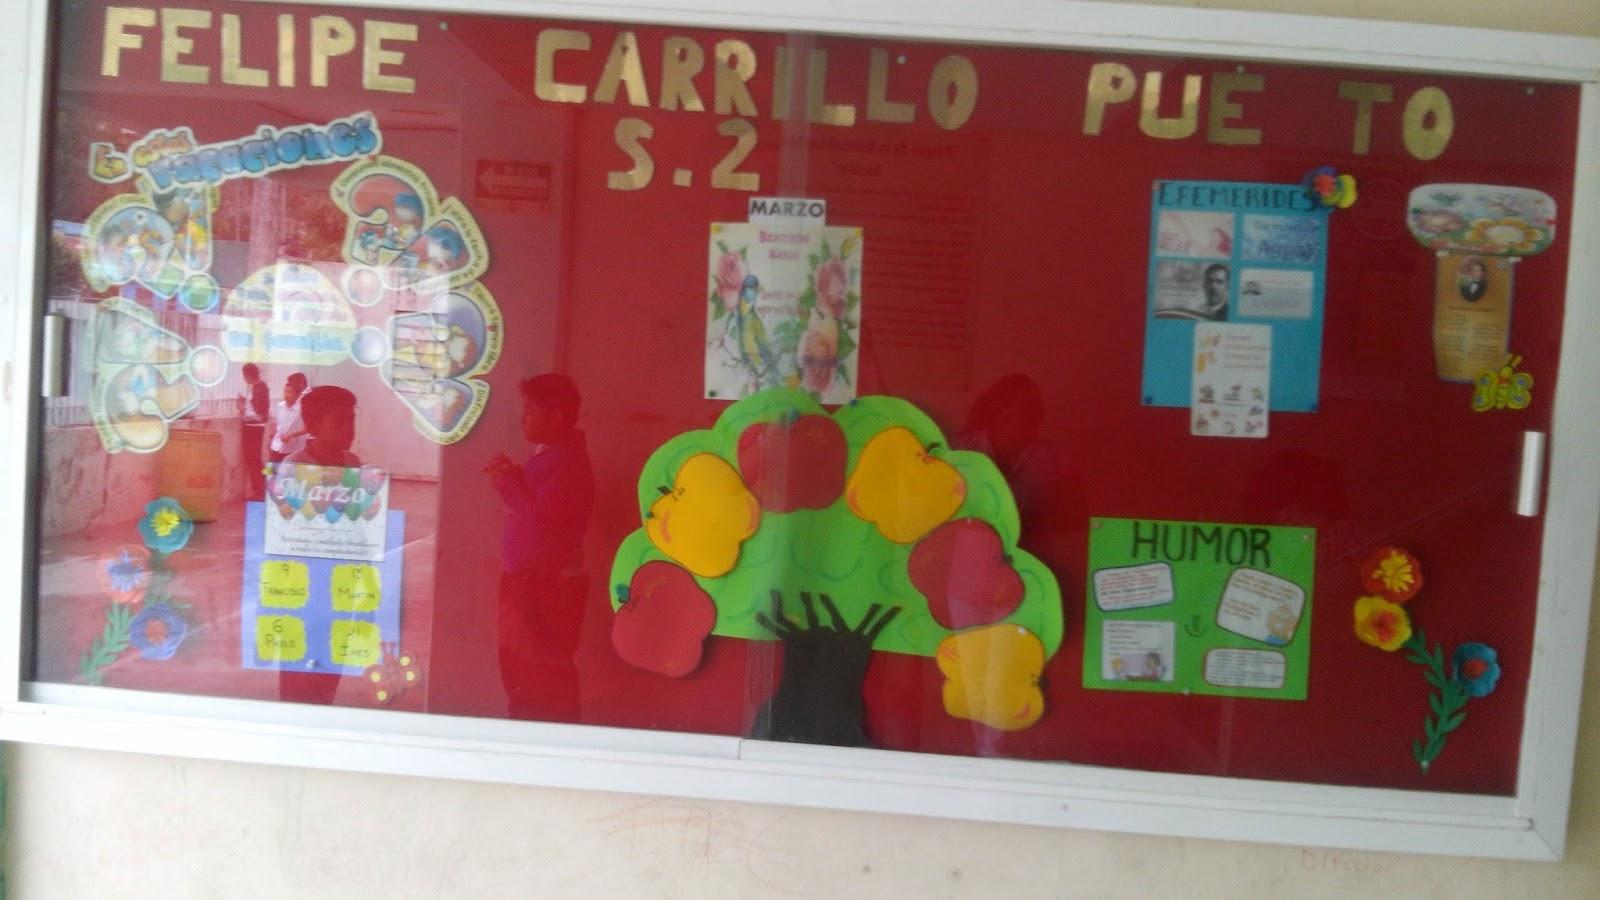 Escuela primaria felipe carrillo puerto seccion 2 for Mural de prepa 1 toluca